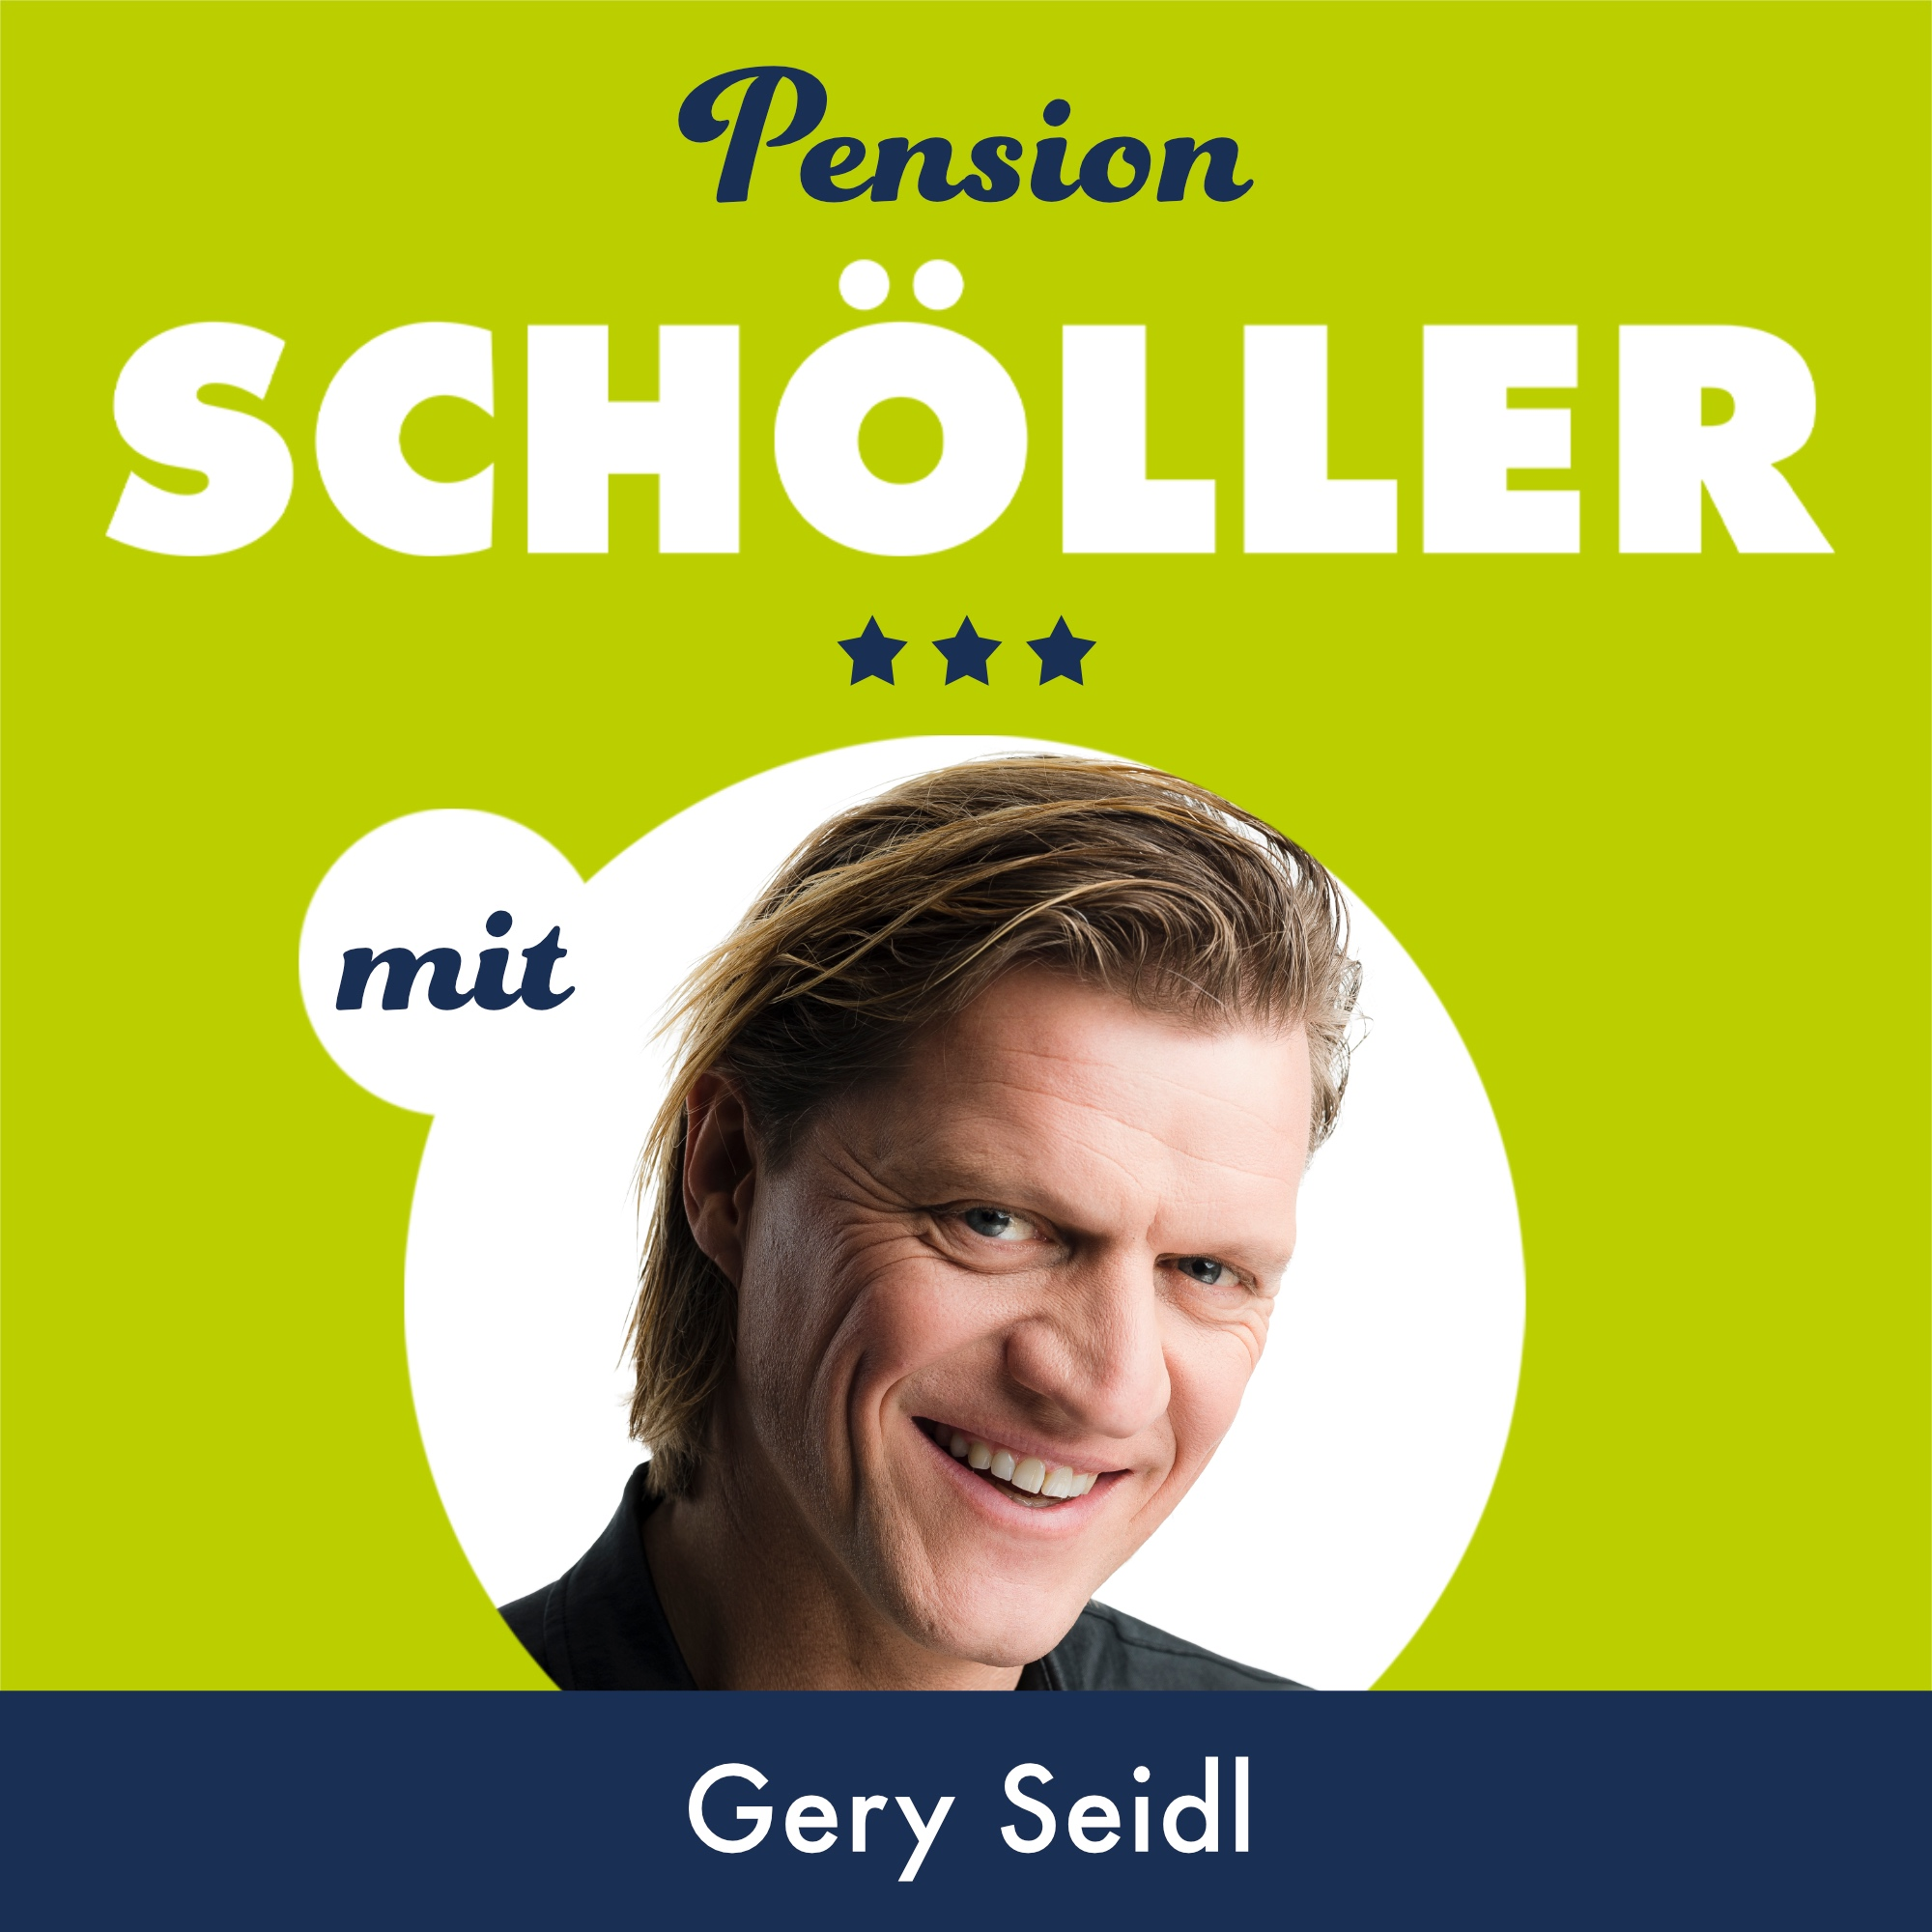 #4 Gery Seidl